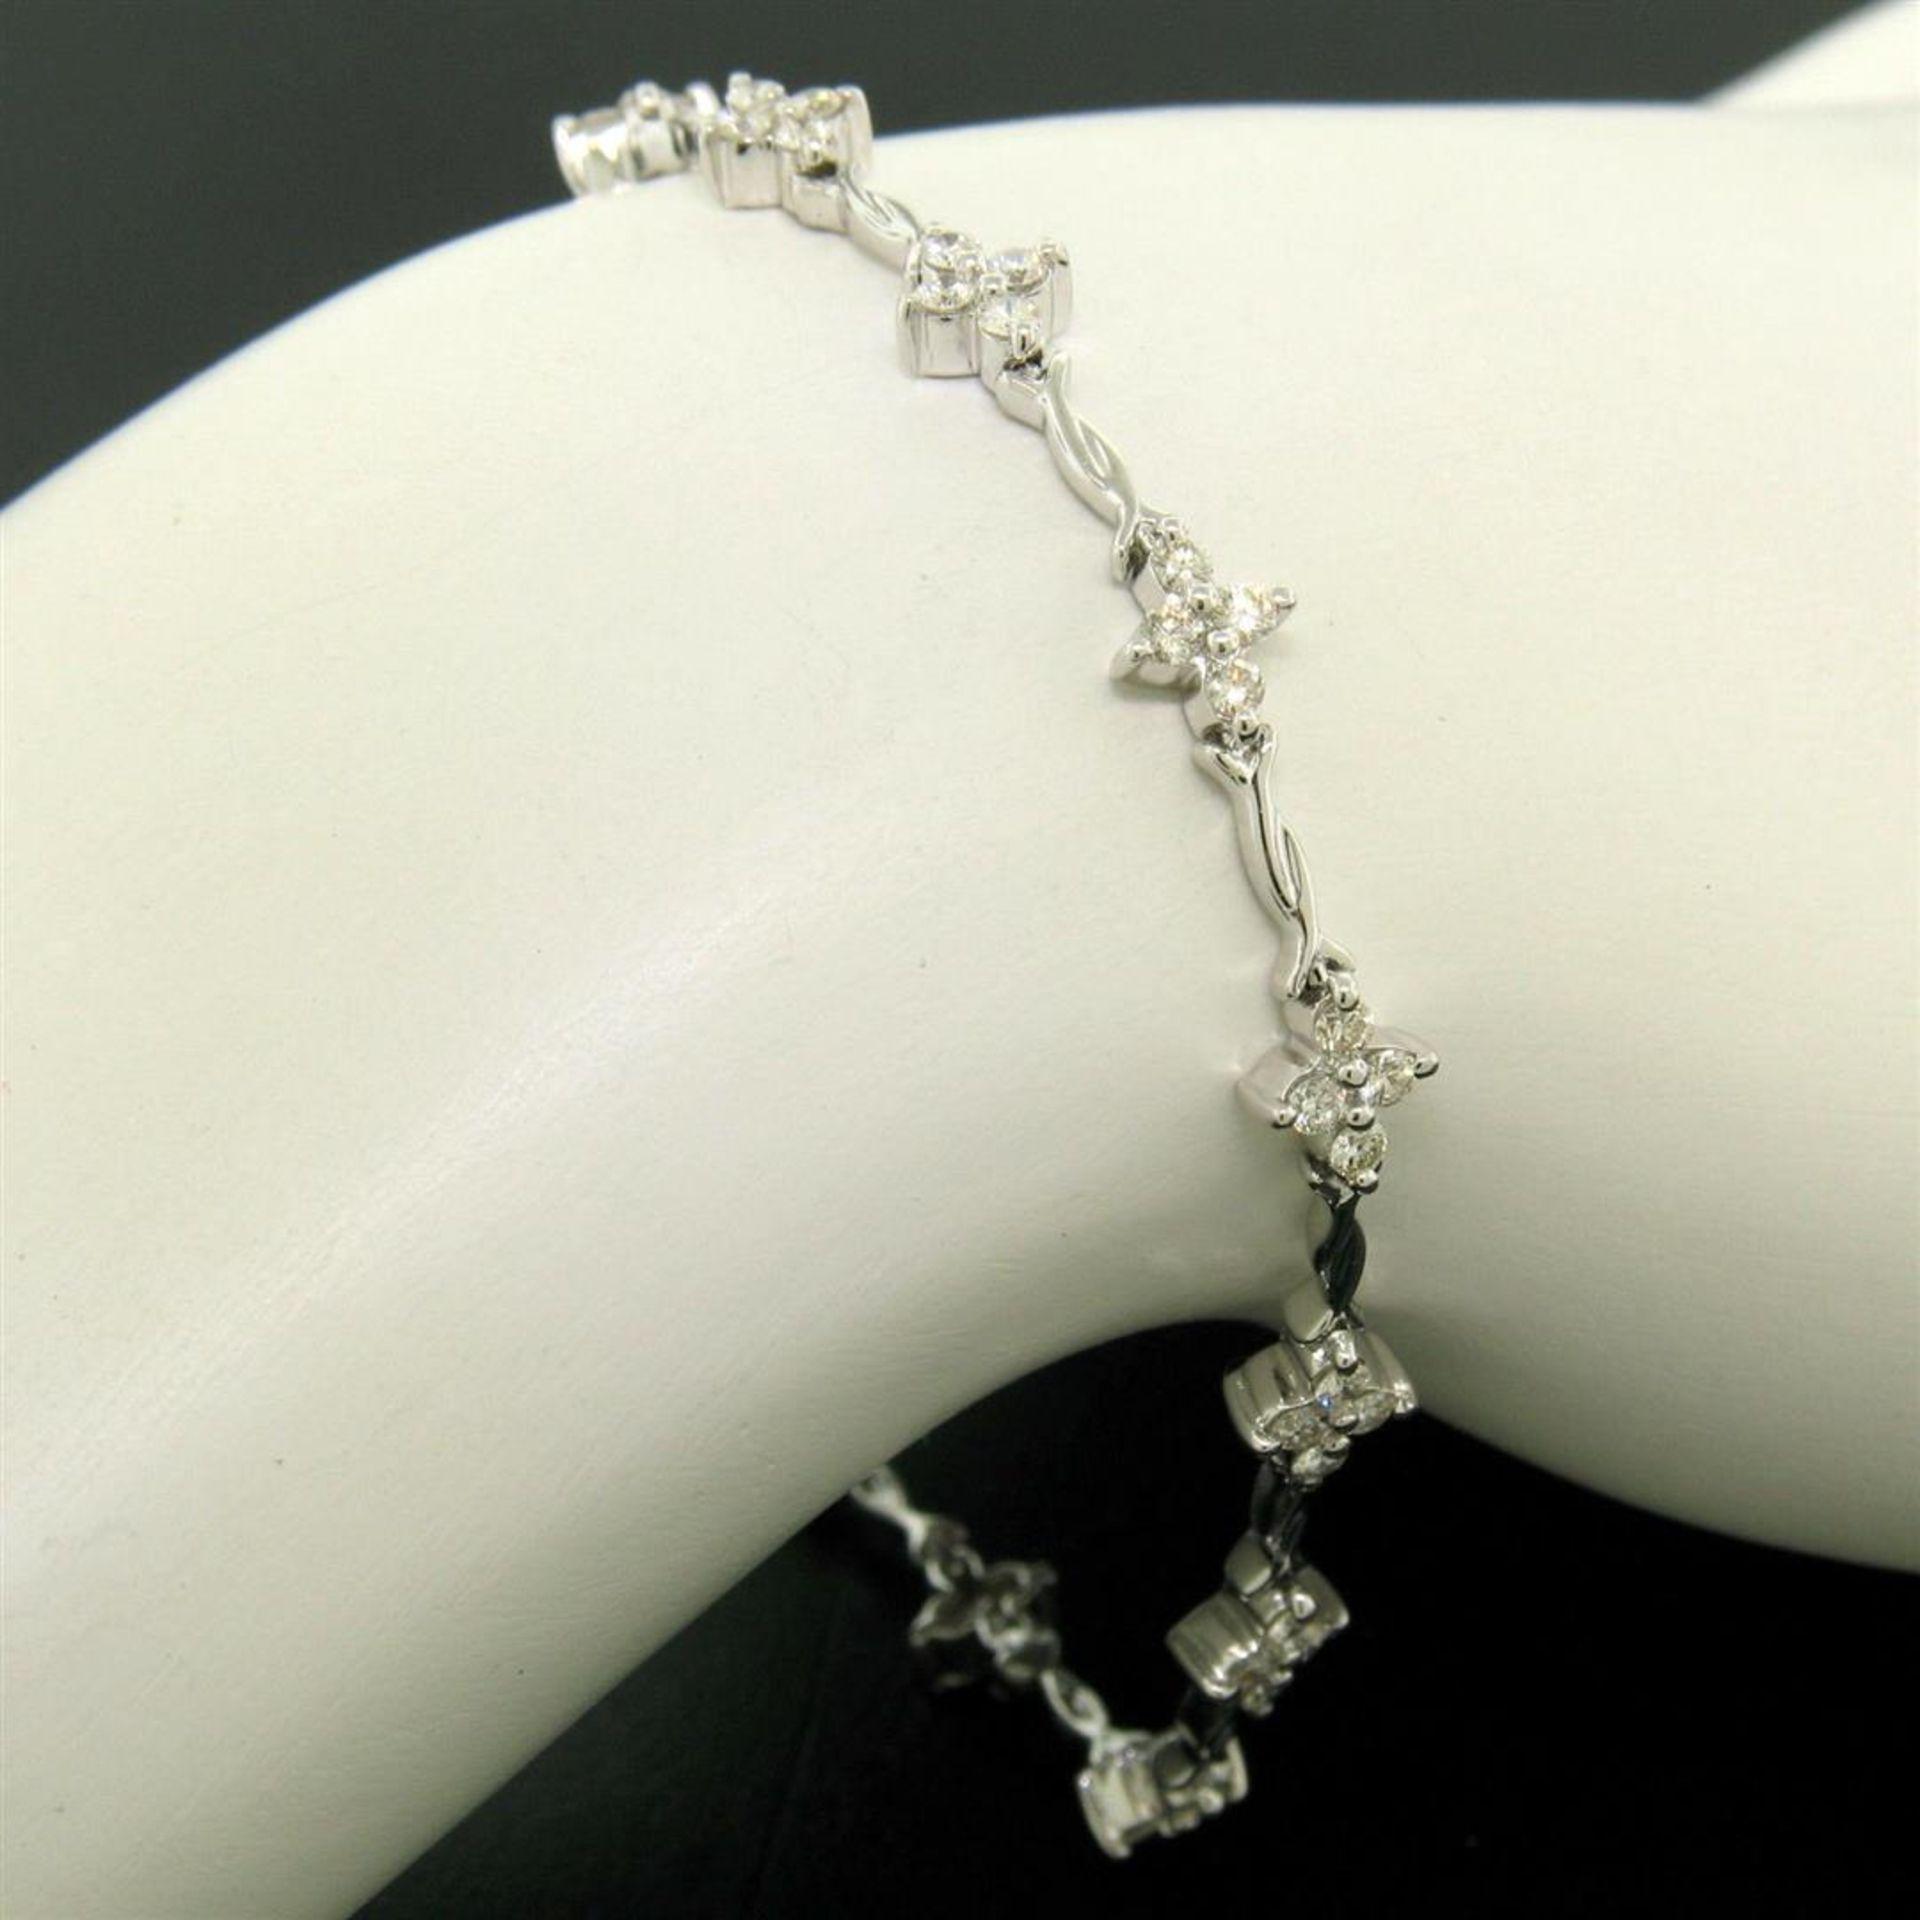 18K White Gold 1.65ctw Diamond Flower Cluster Twisted Wire Link Tennis Bracelet